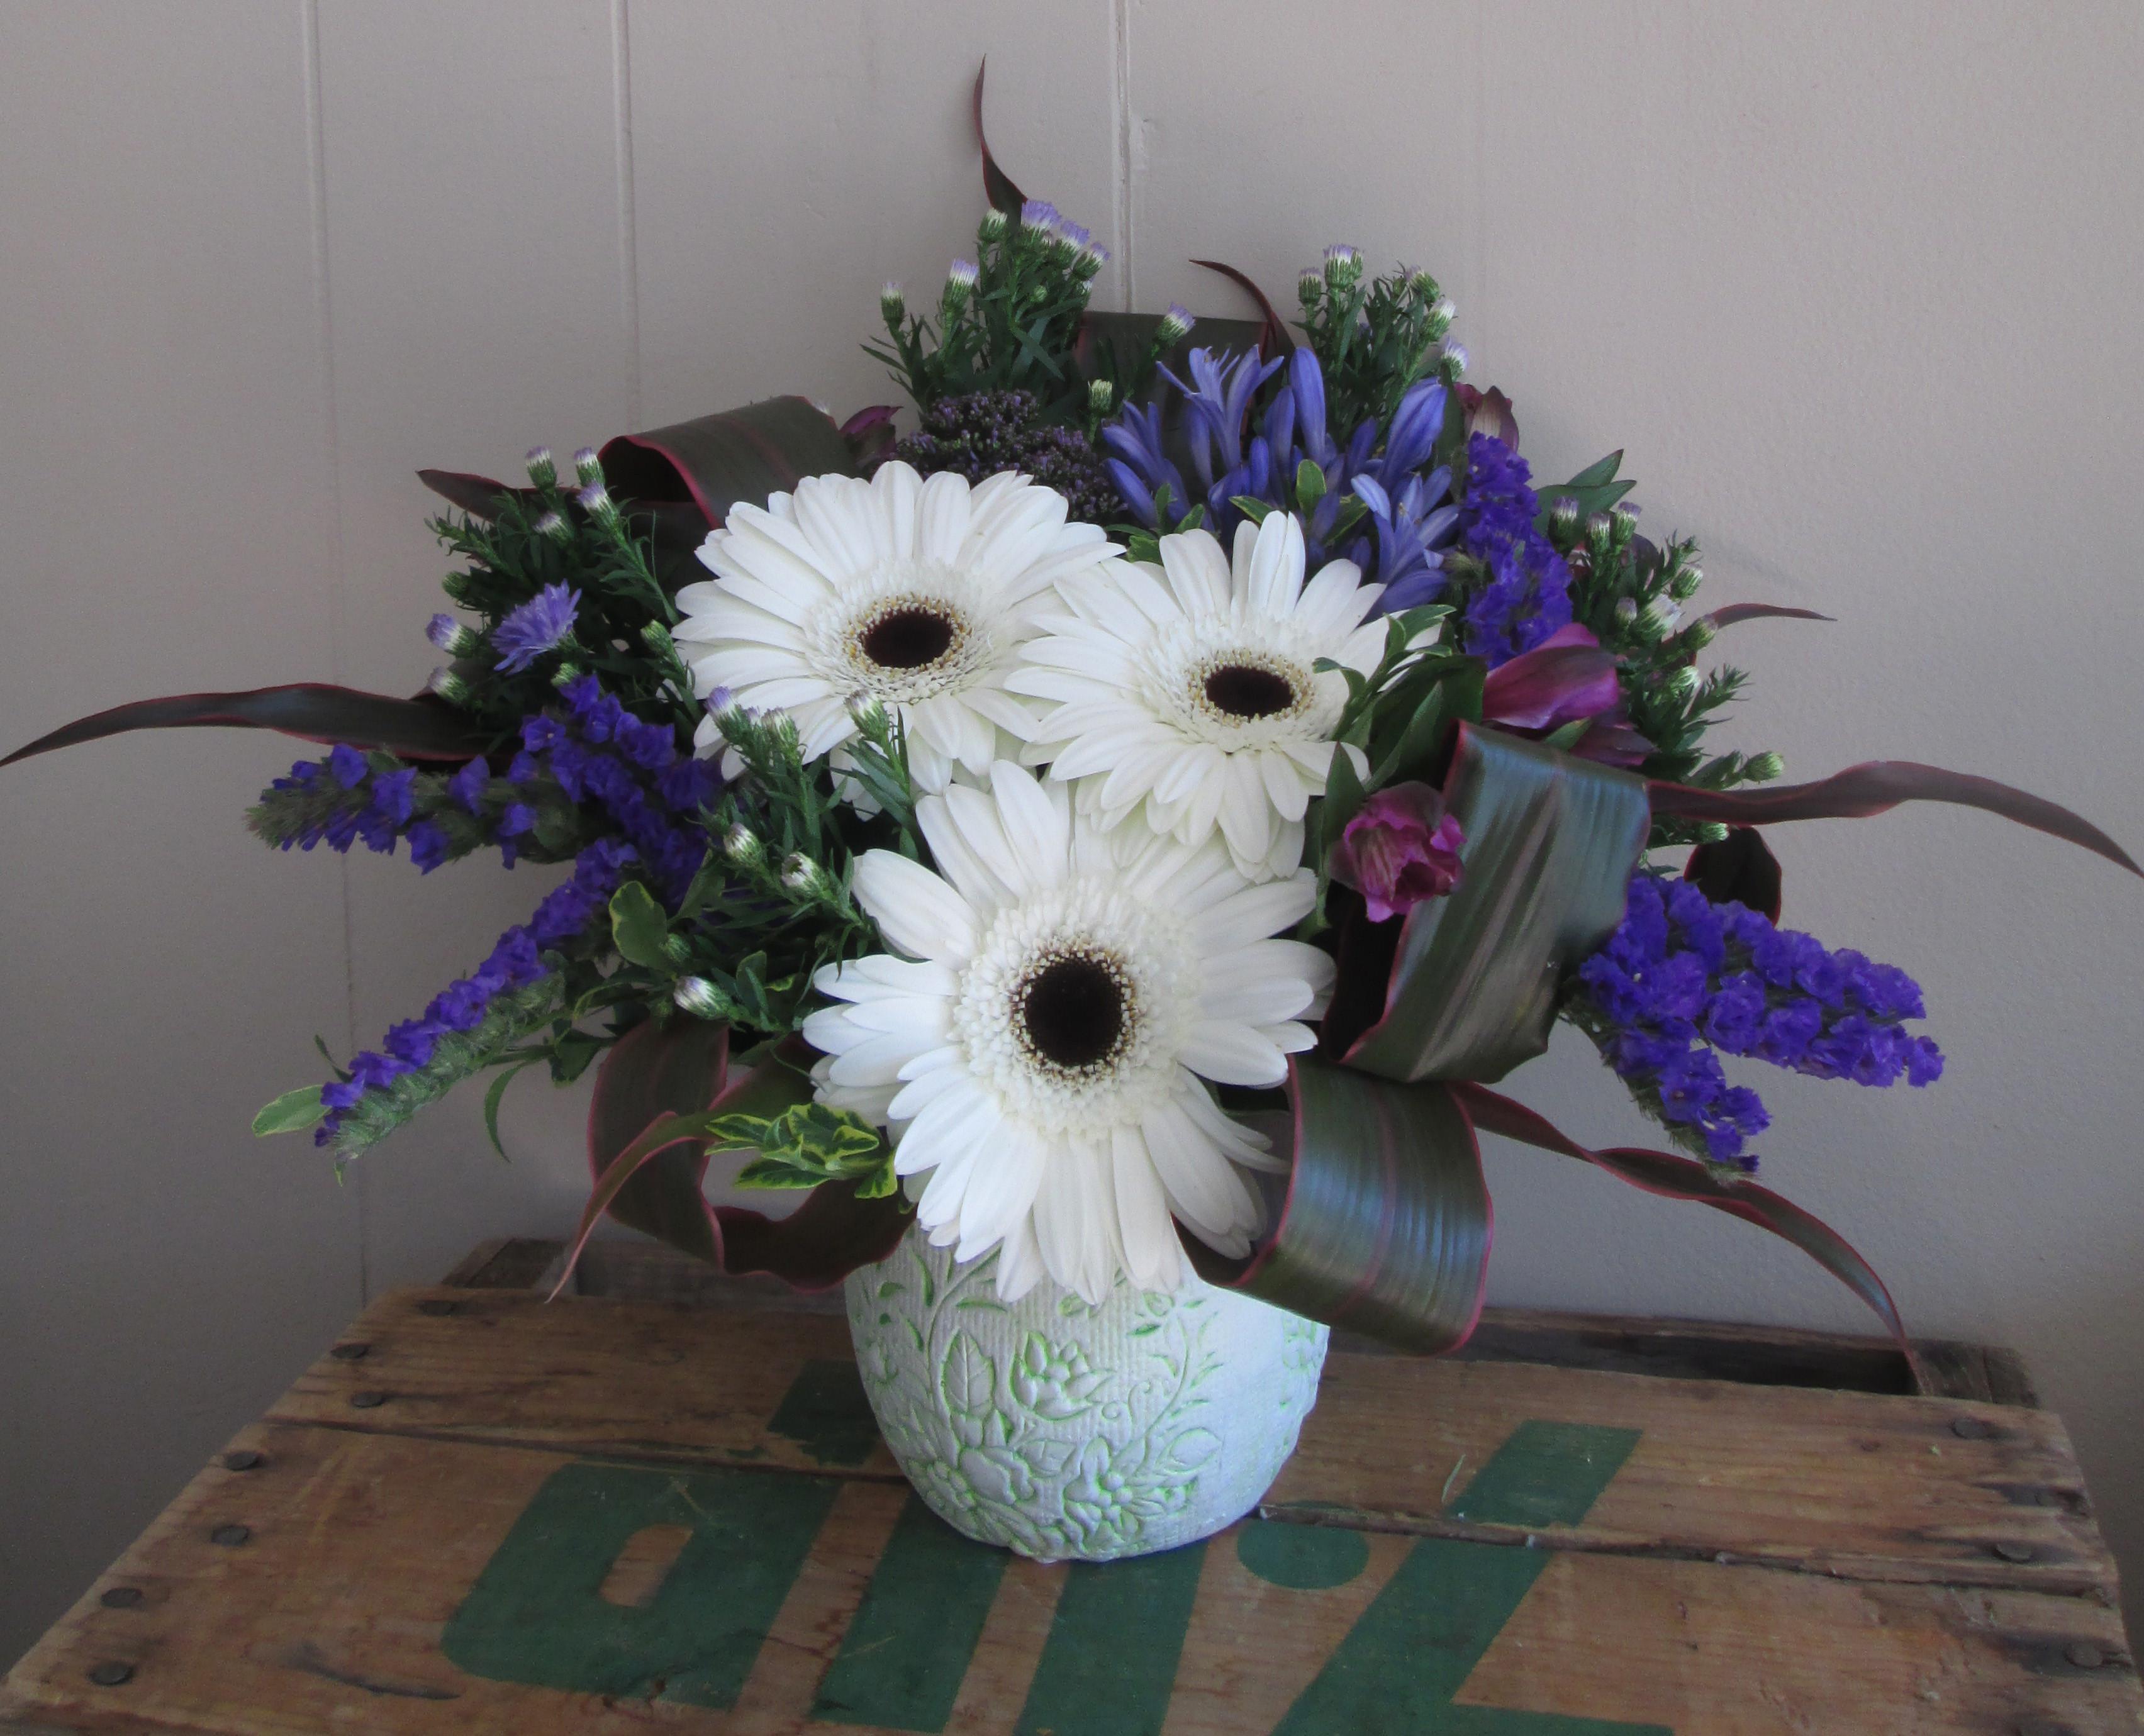 Willow park florist calgary se purply izmirmasajfo